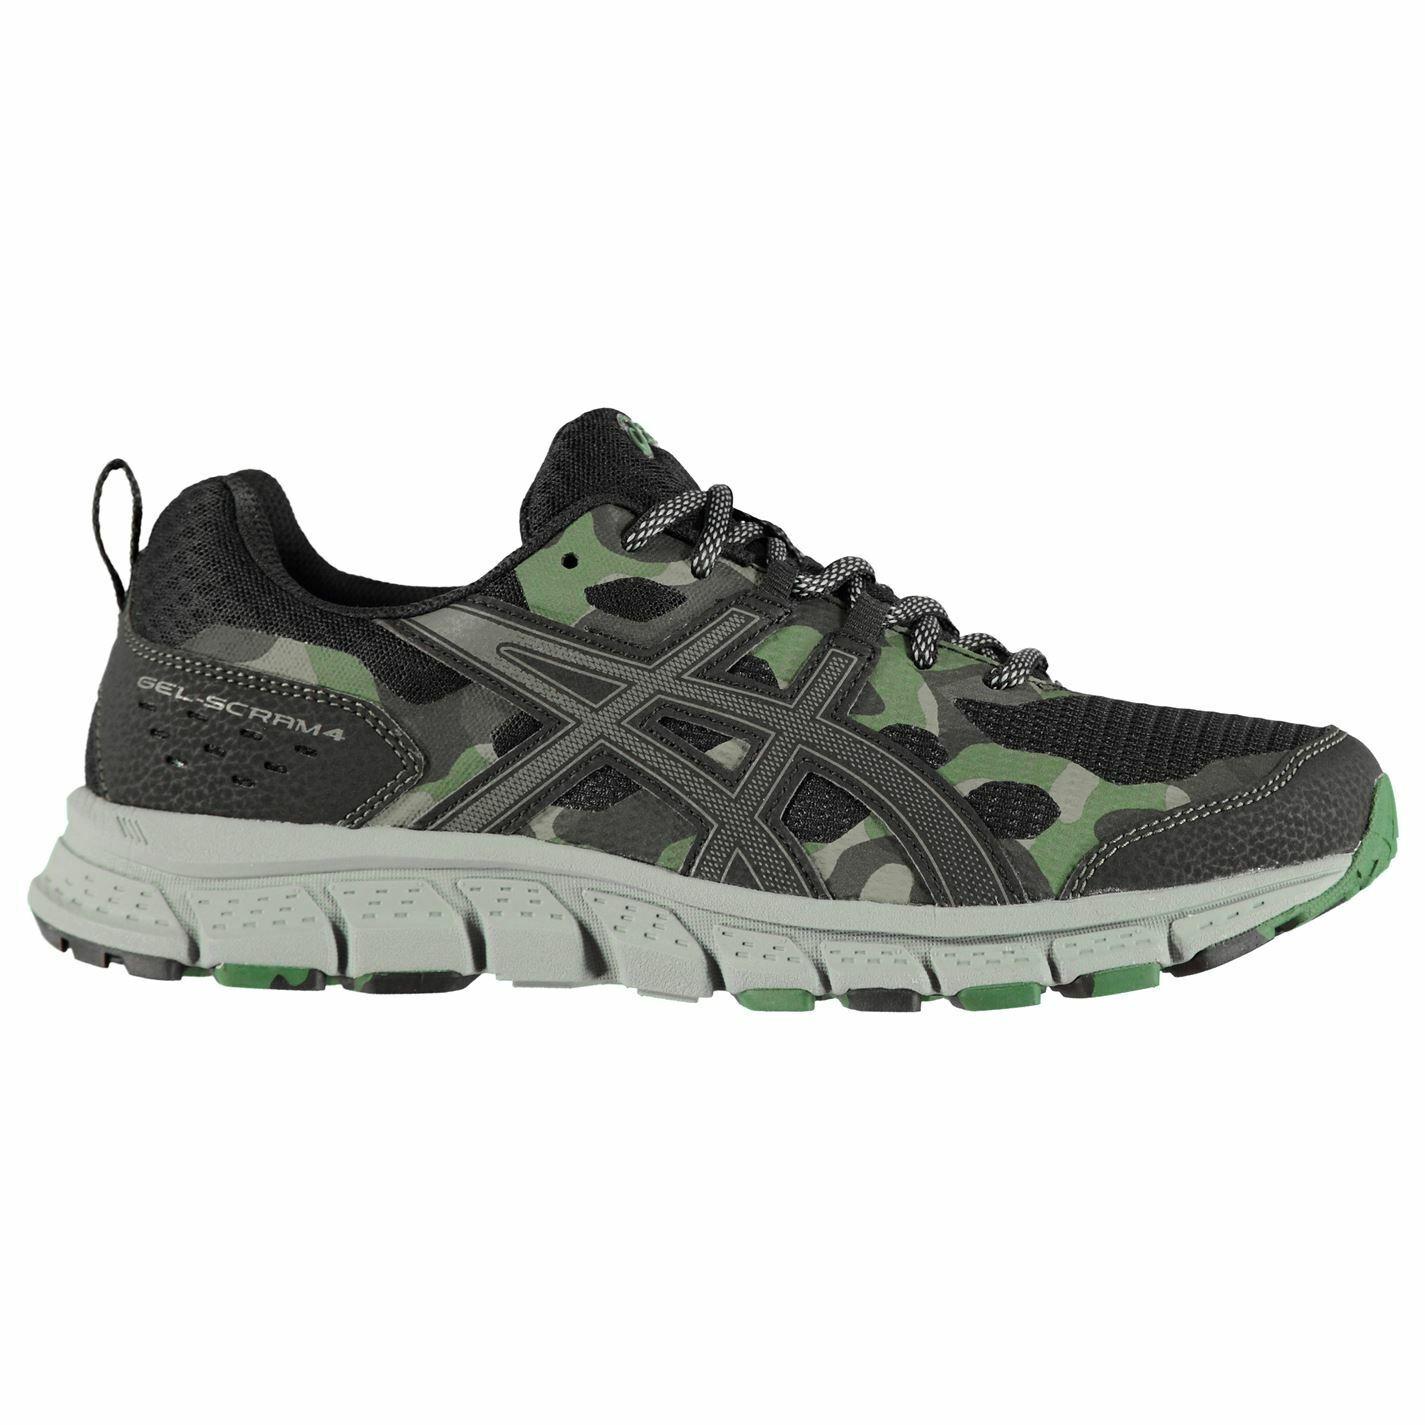 Asics Mens Gel Scram 4 Trail Running shoes Lace Up